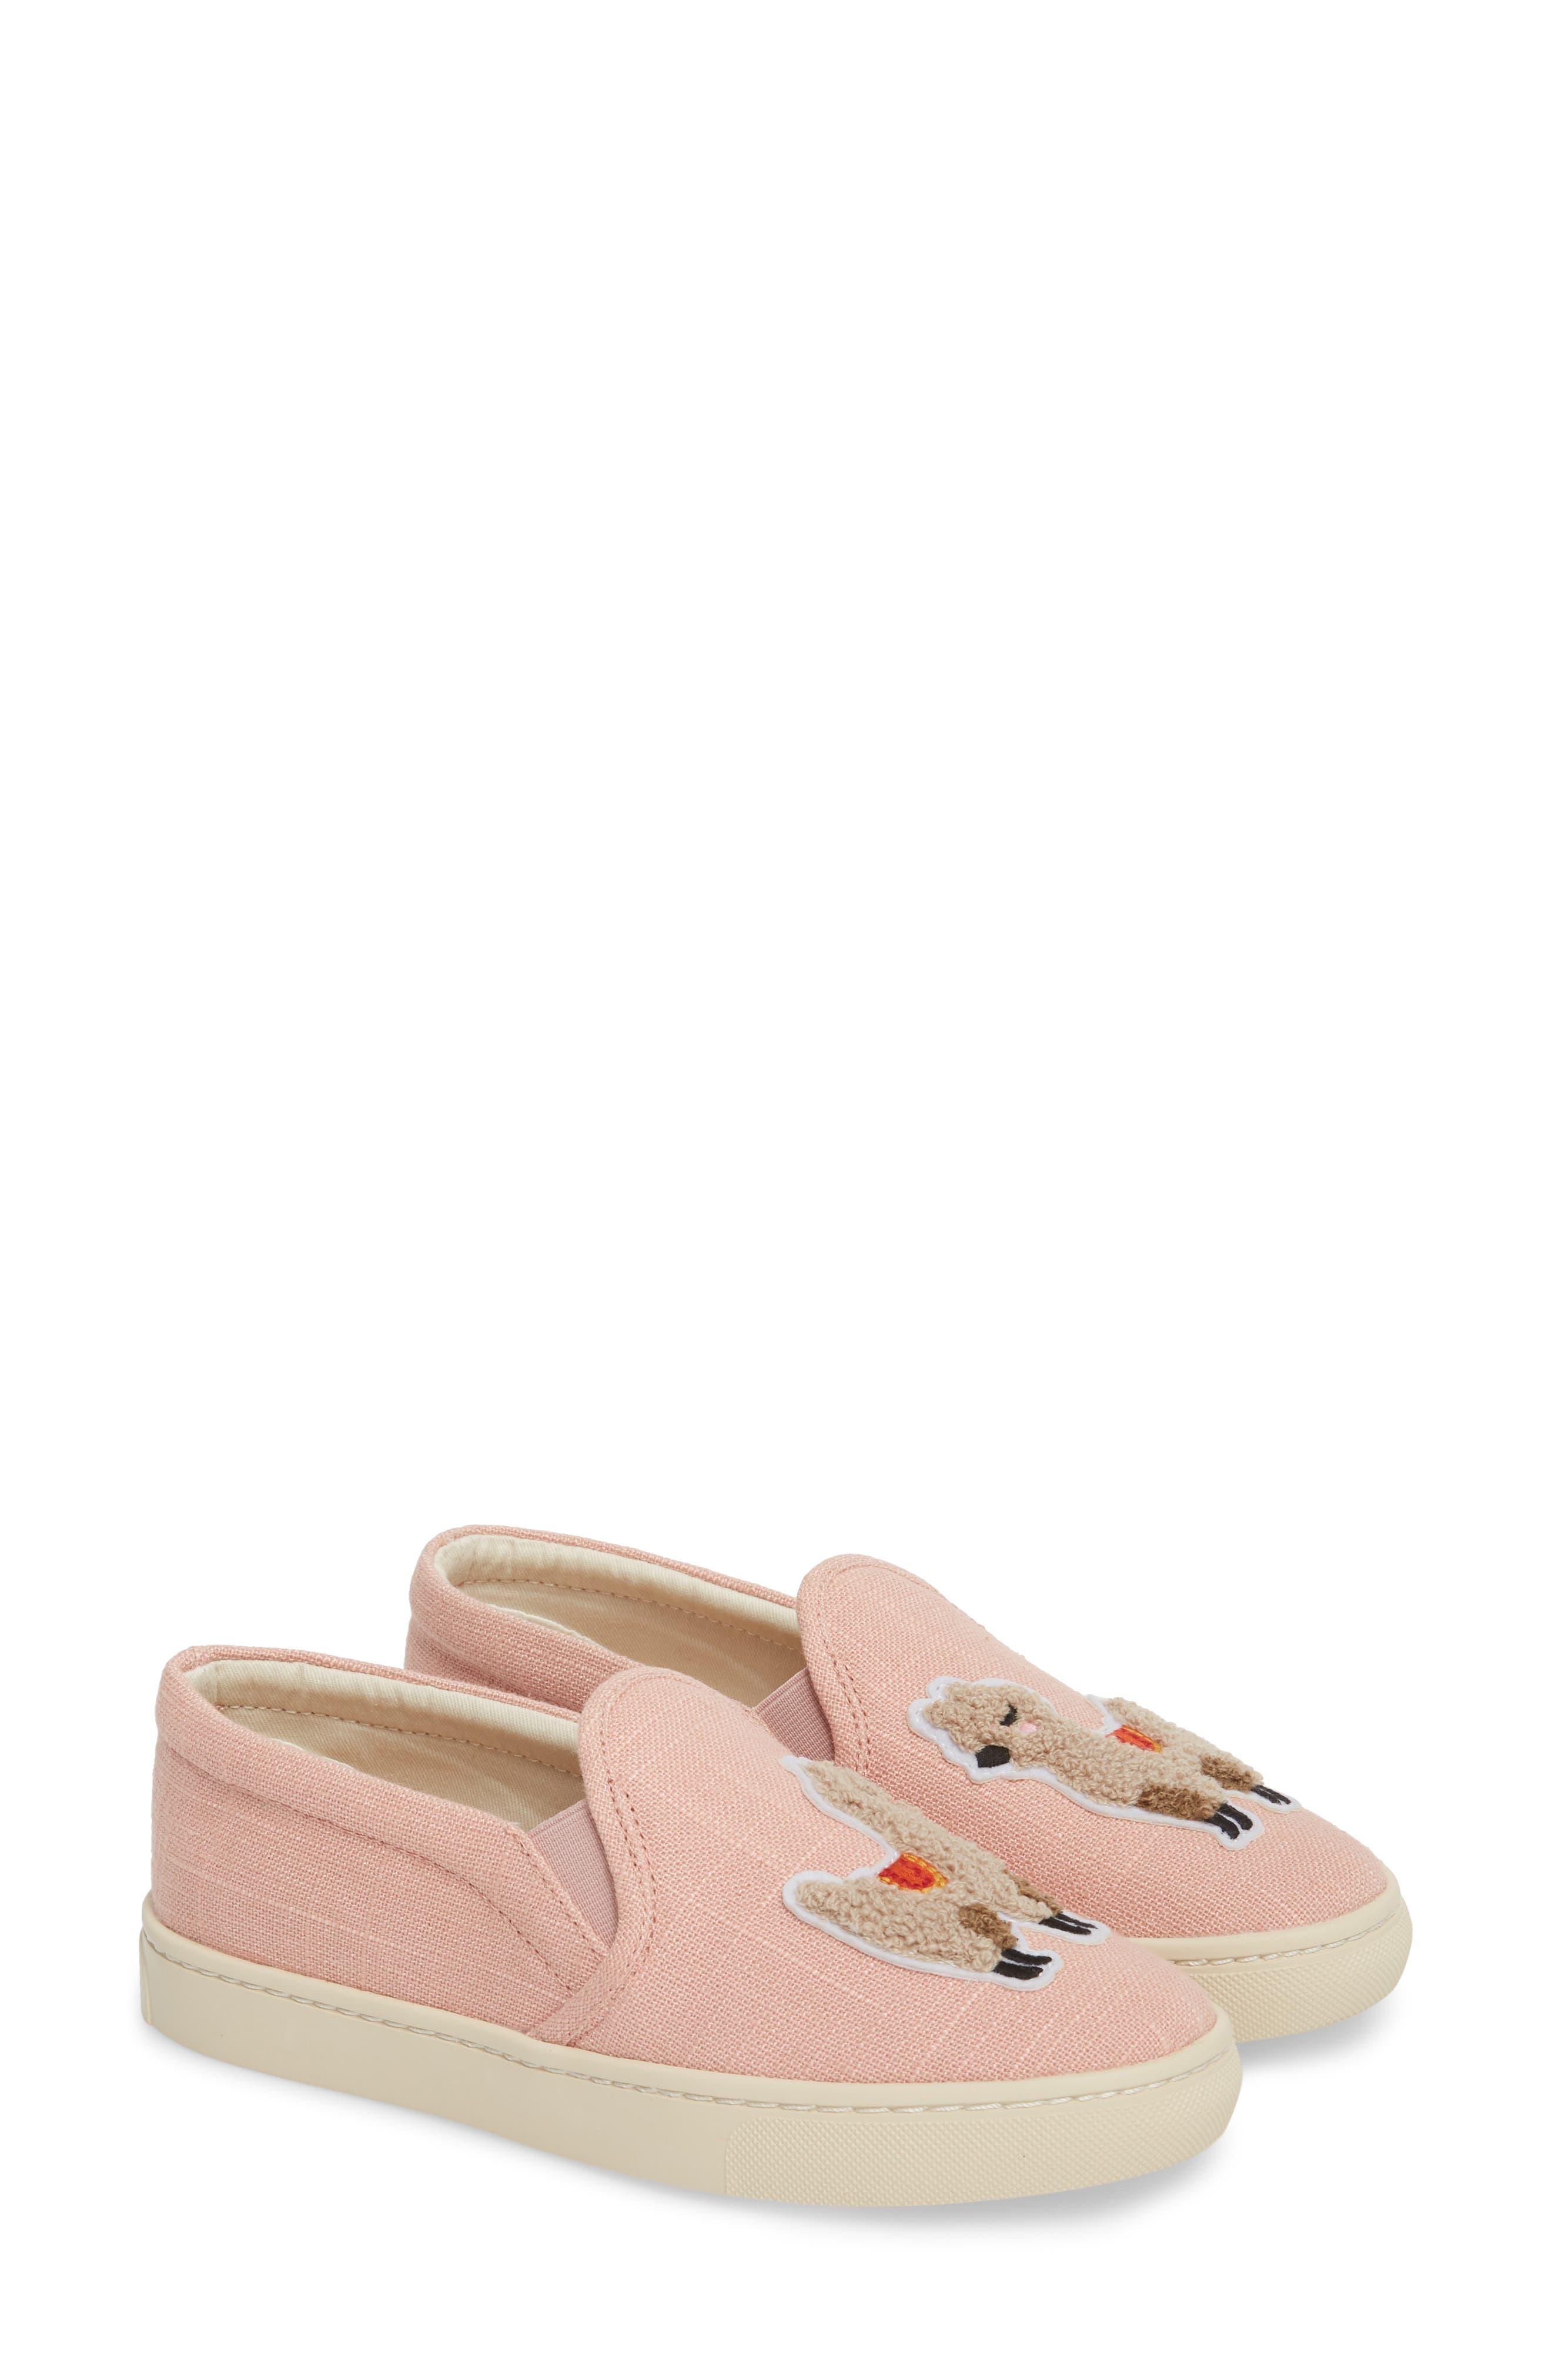 Llama Slip-On Sneaker,                             Alternate thumbnail 2, color,                             Dusty Rose Fabric